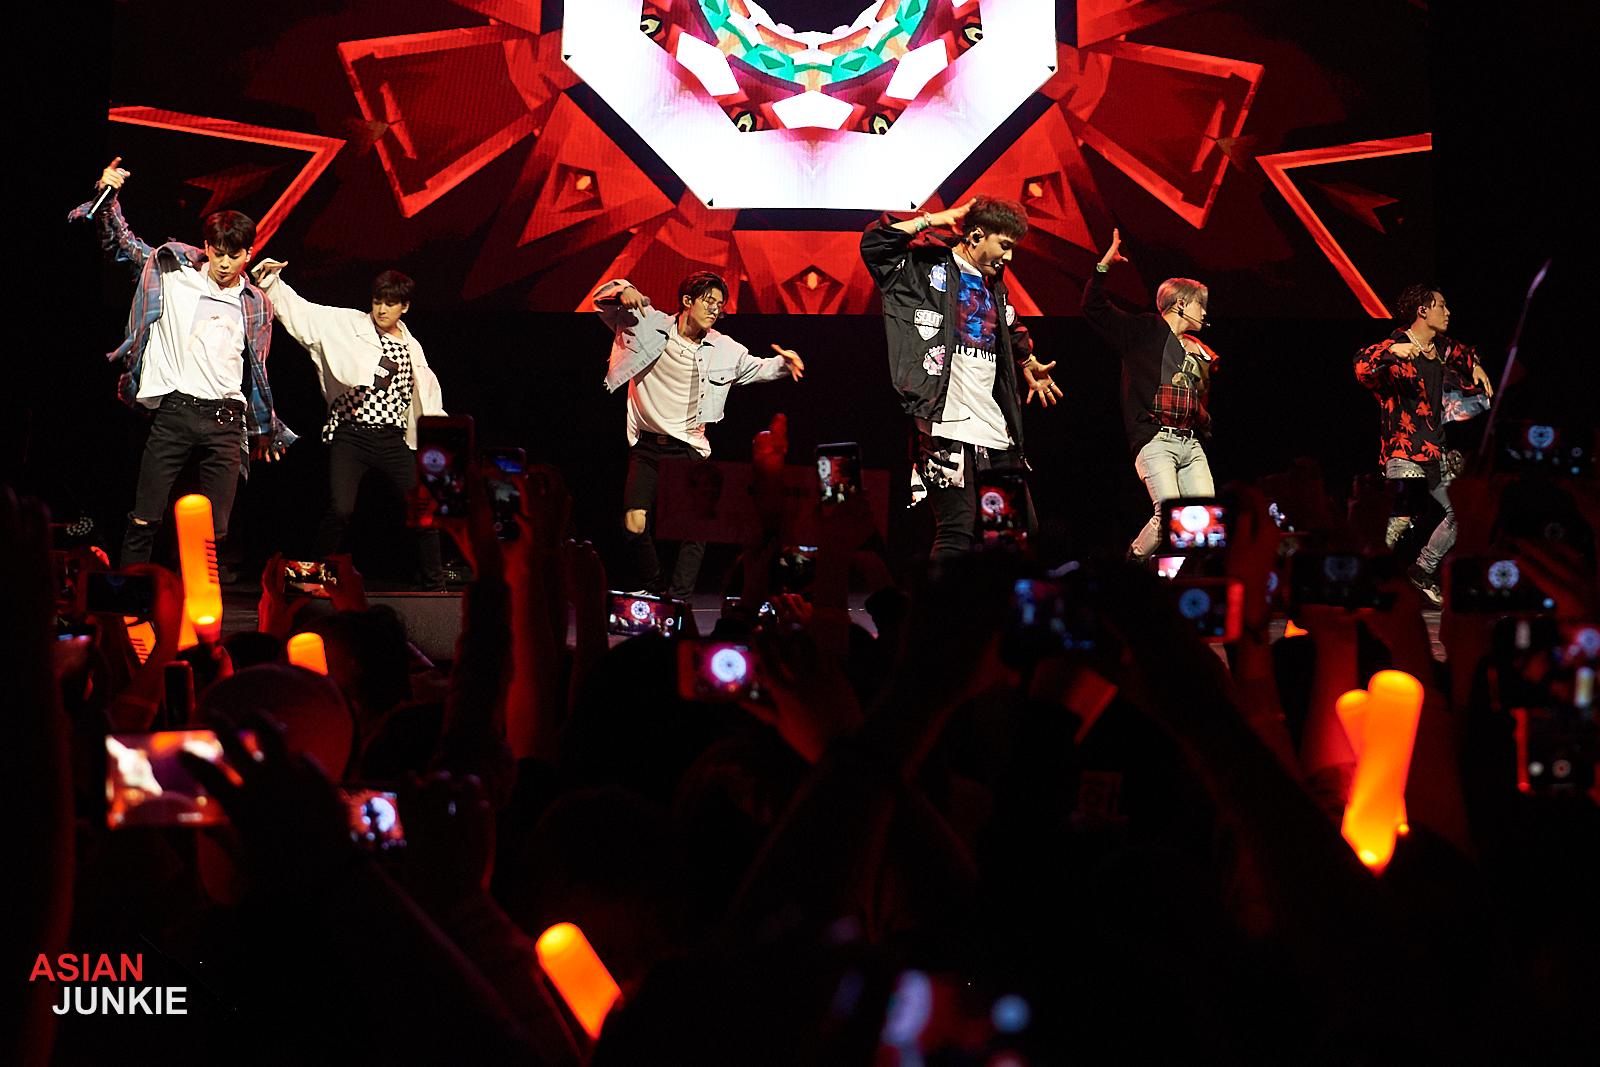 SXSW 2019: iKON headline KOCCA's Korea Spotlight with their